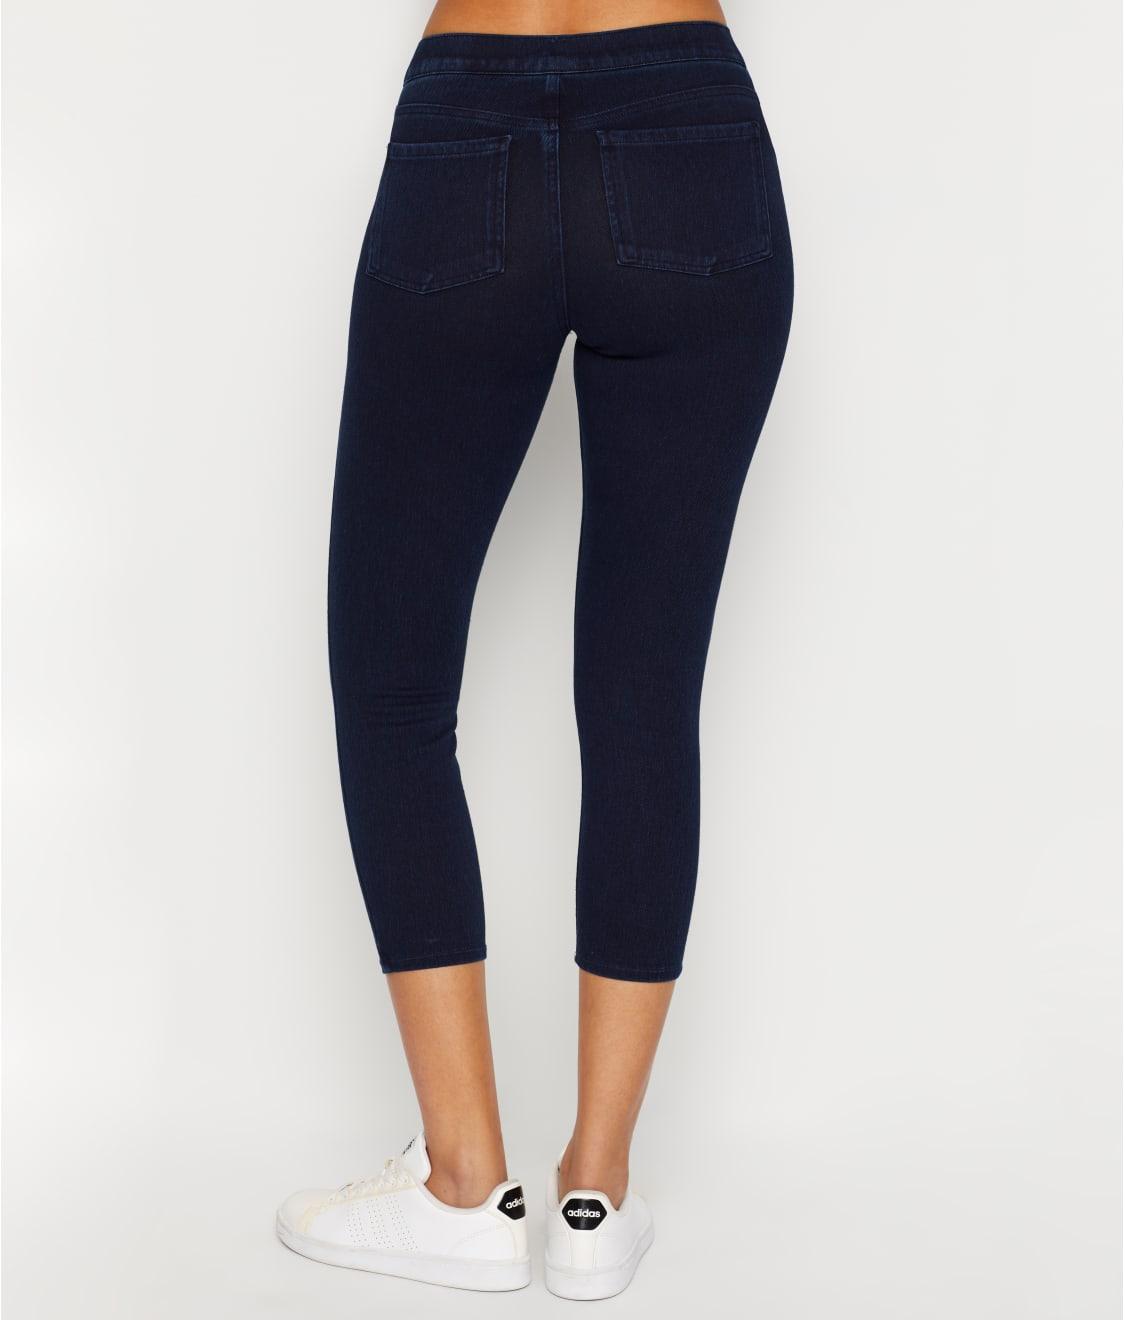 Spanx Cropped Flare White Denim Leggings 3306 Size Medium